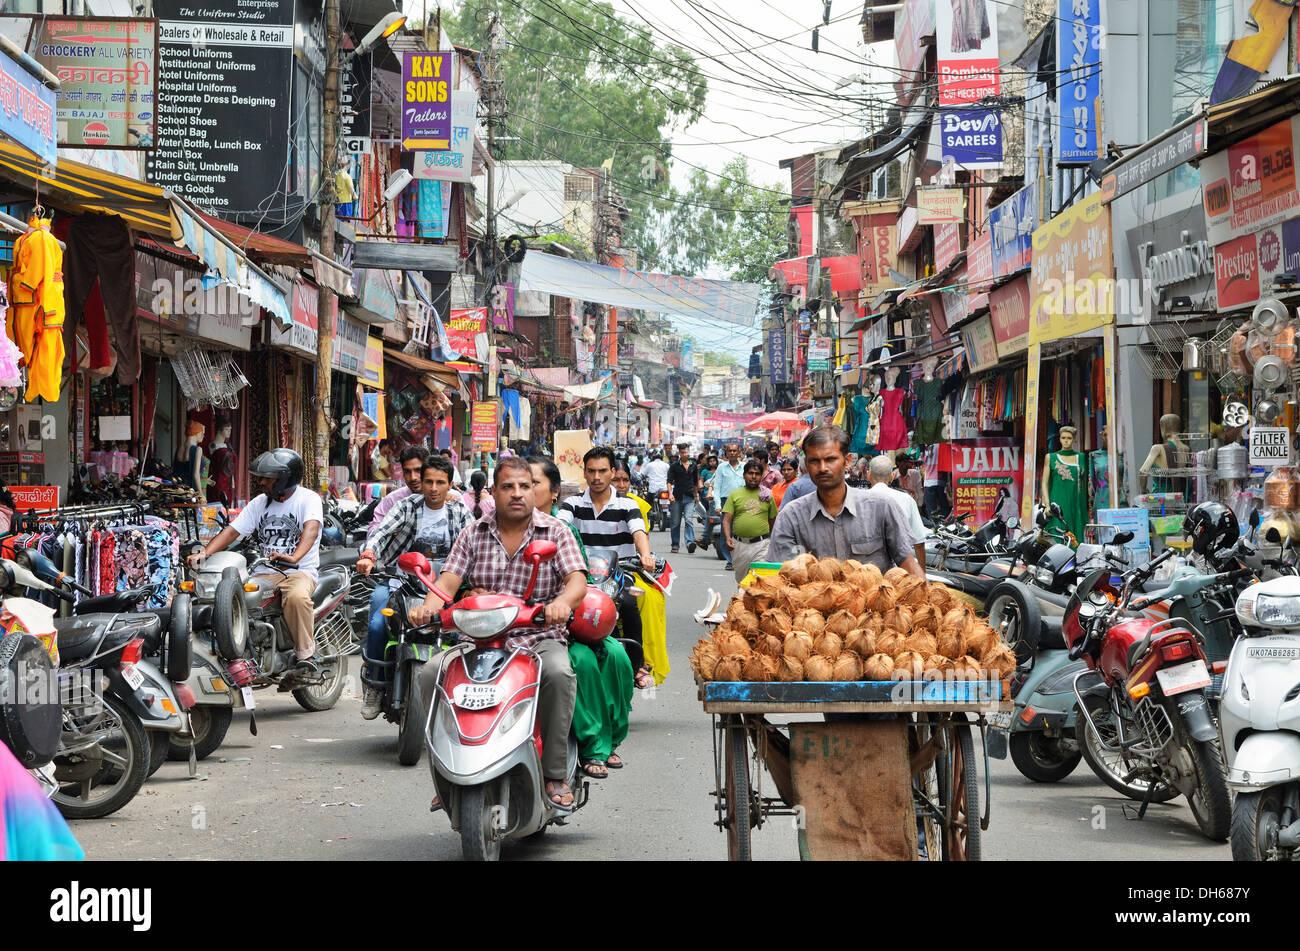 Busy street in Dehradun, Uttarakhand, India - Stock Image